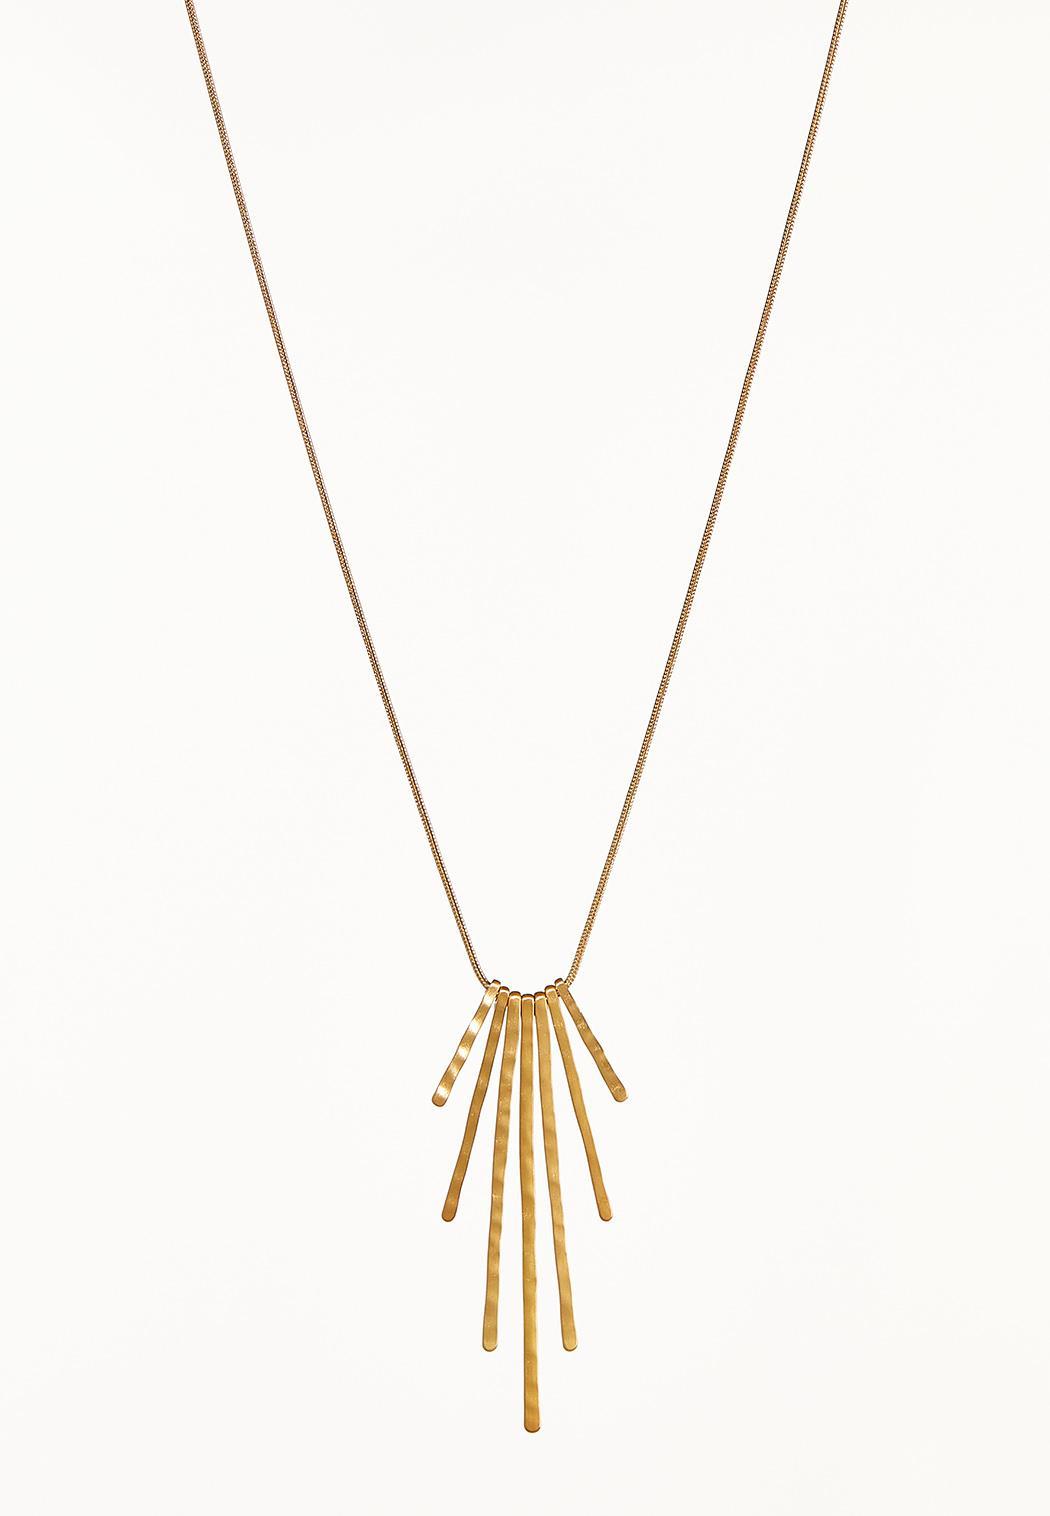 Hammered Stick Necklace